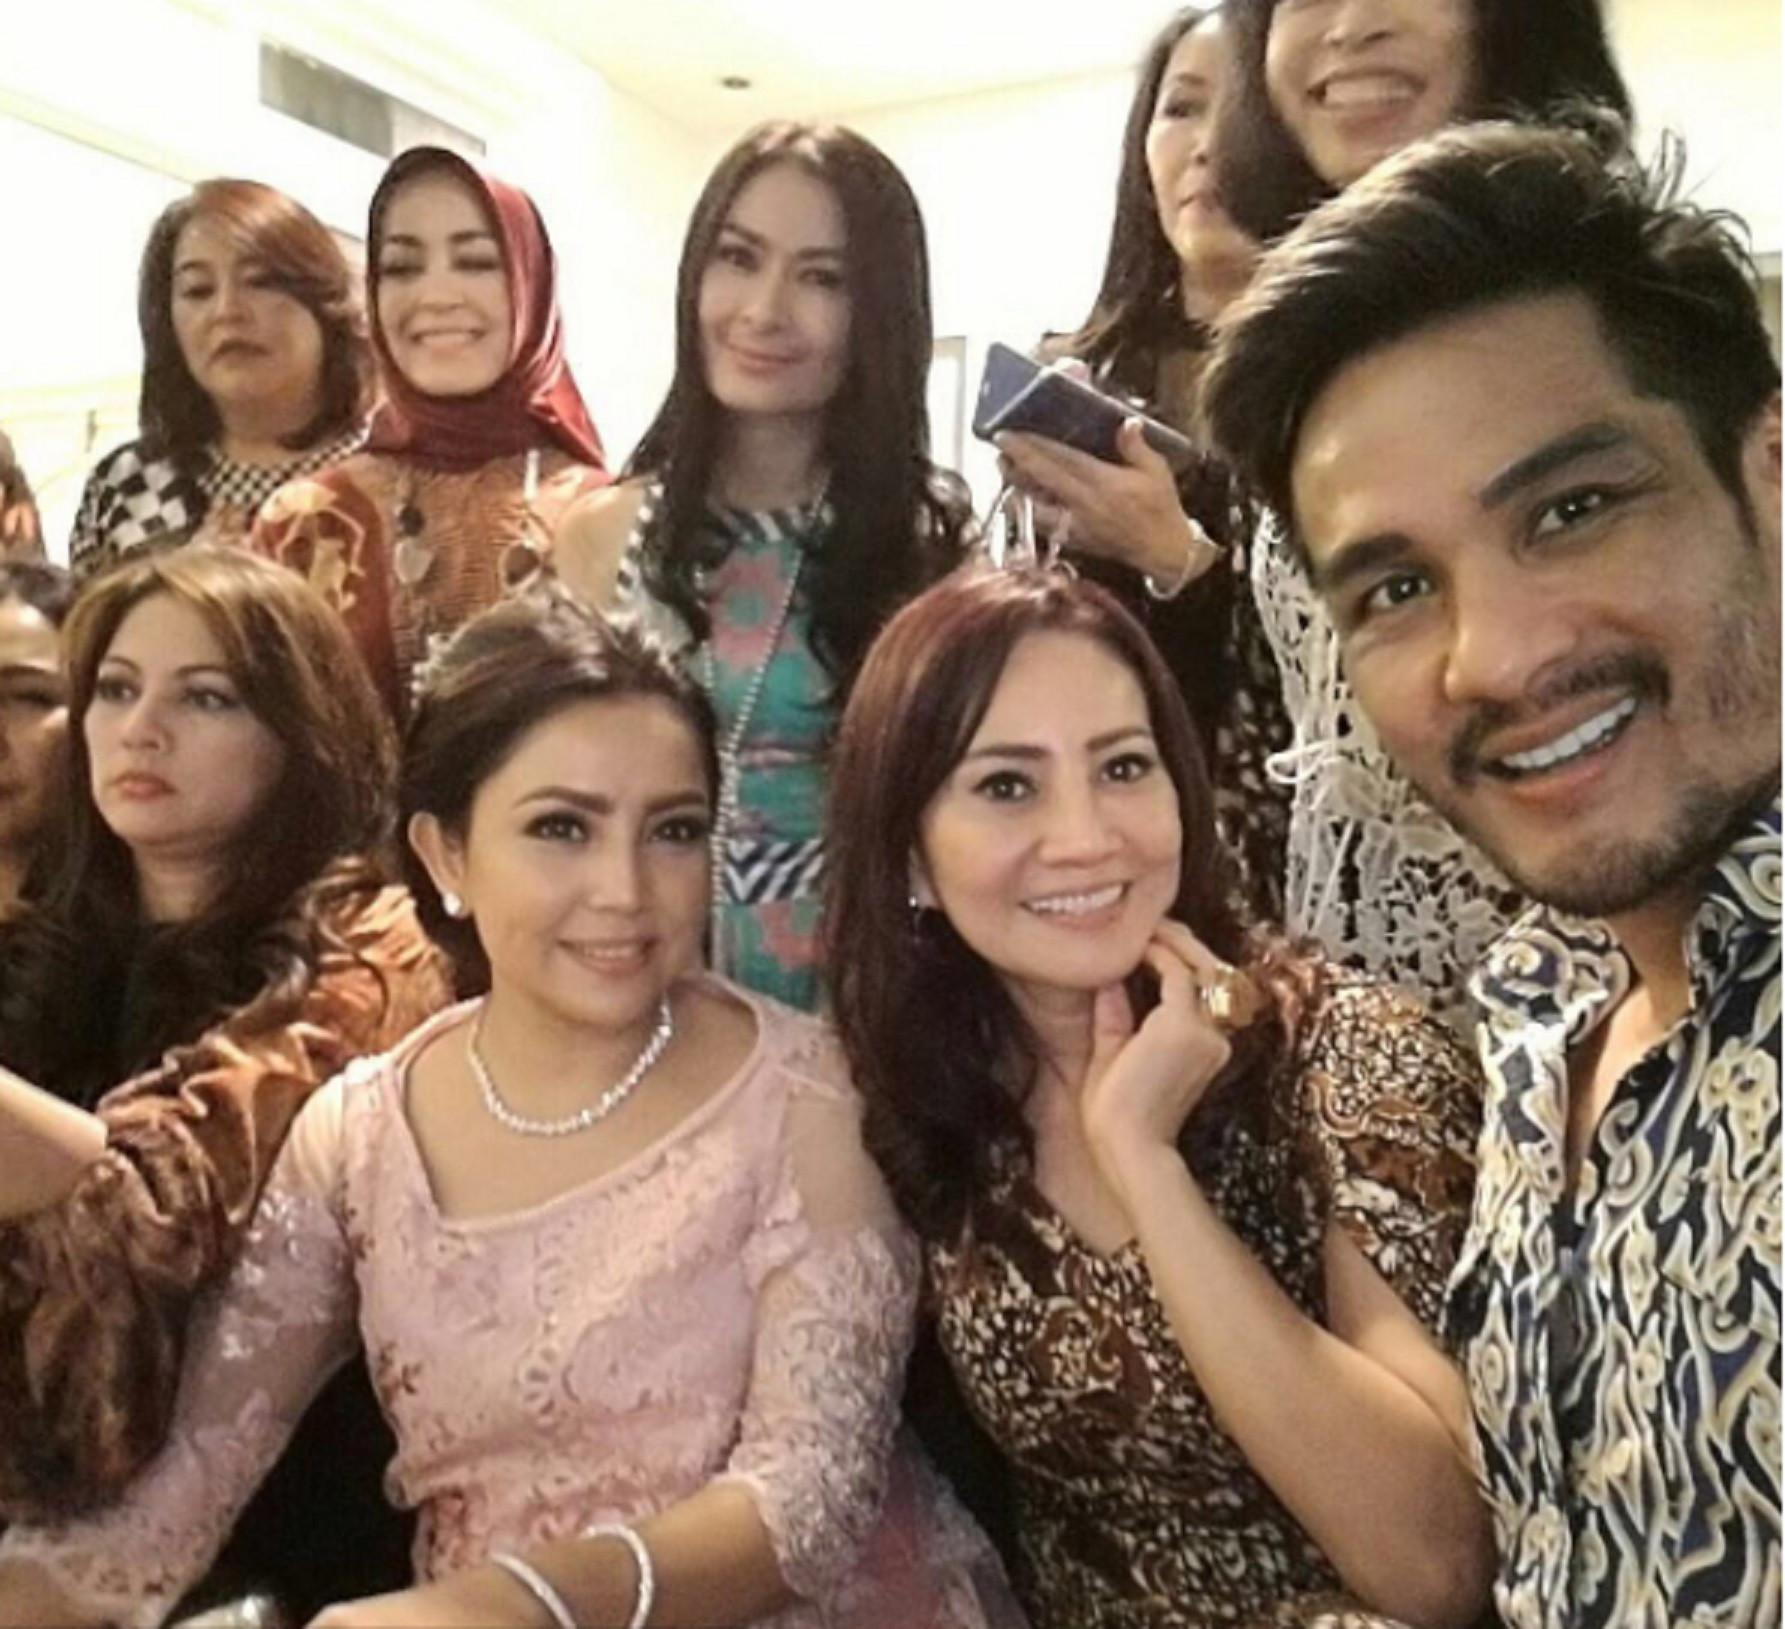 Mayangsari berkumpul bersama teman-temannya saat merayakan ultah pernikahannya yang ke-17 bersama Bambang Trihatmodjo. (Instagram @isdadahlia)